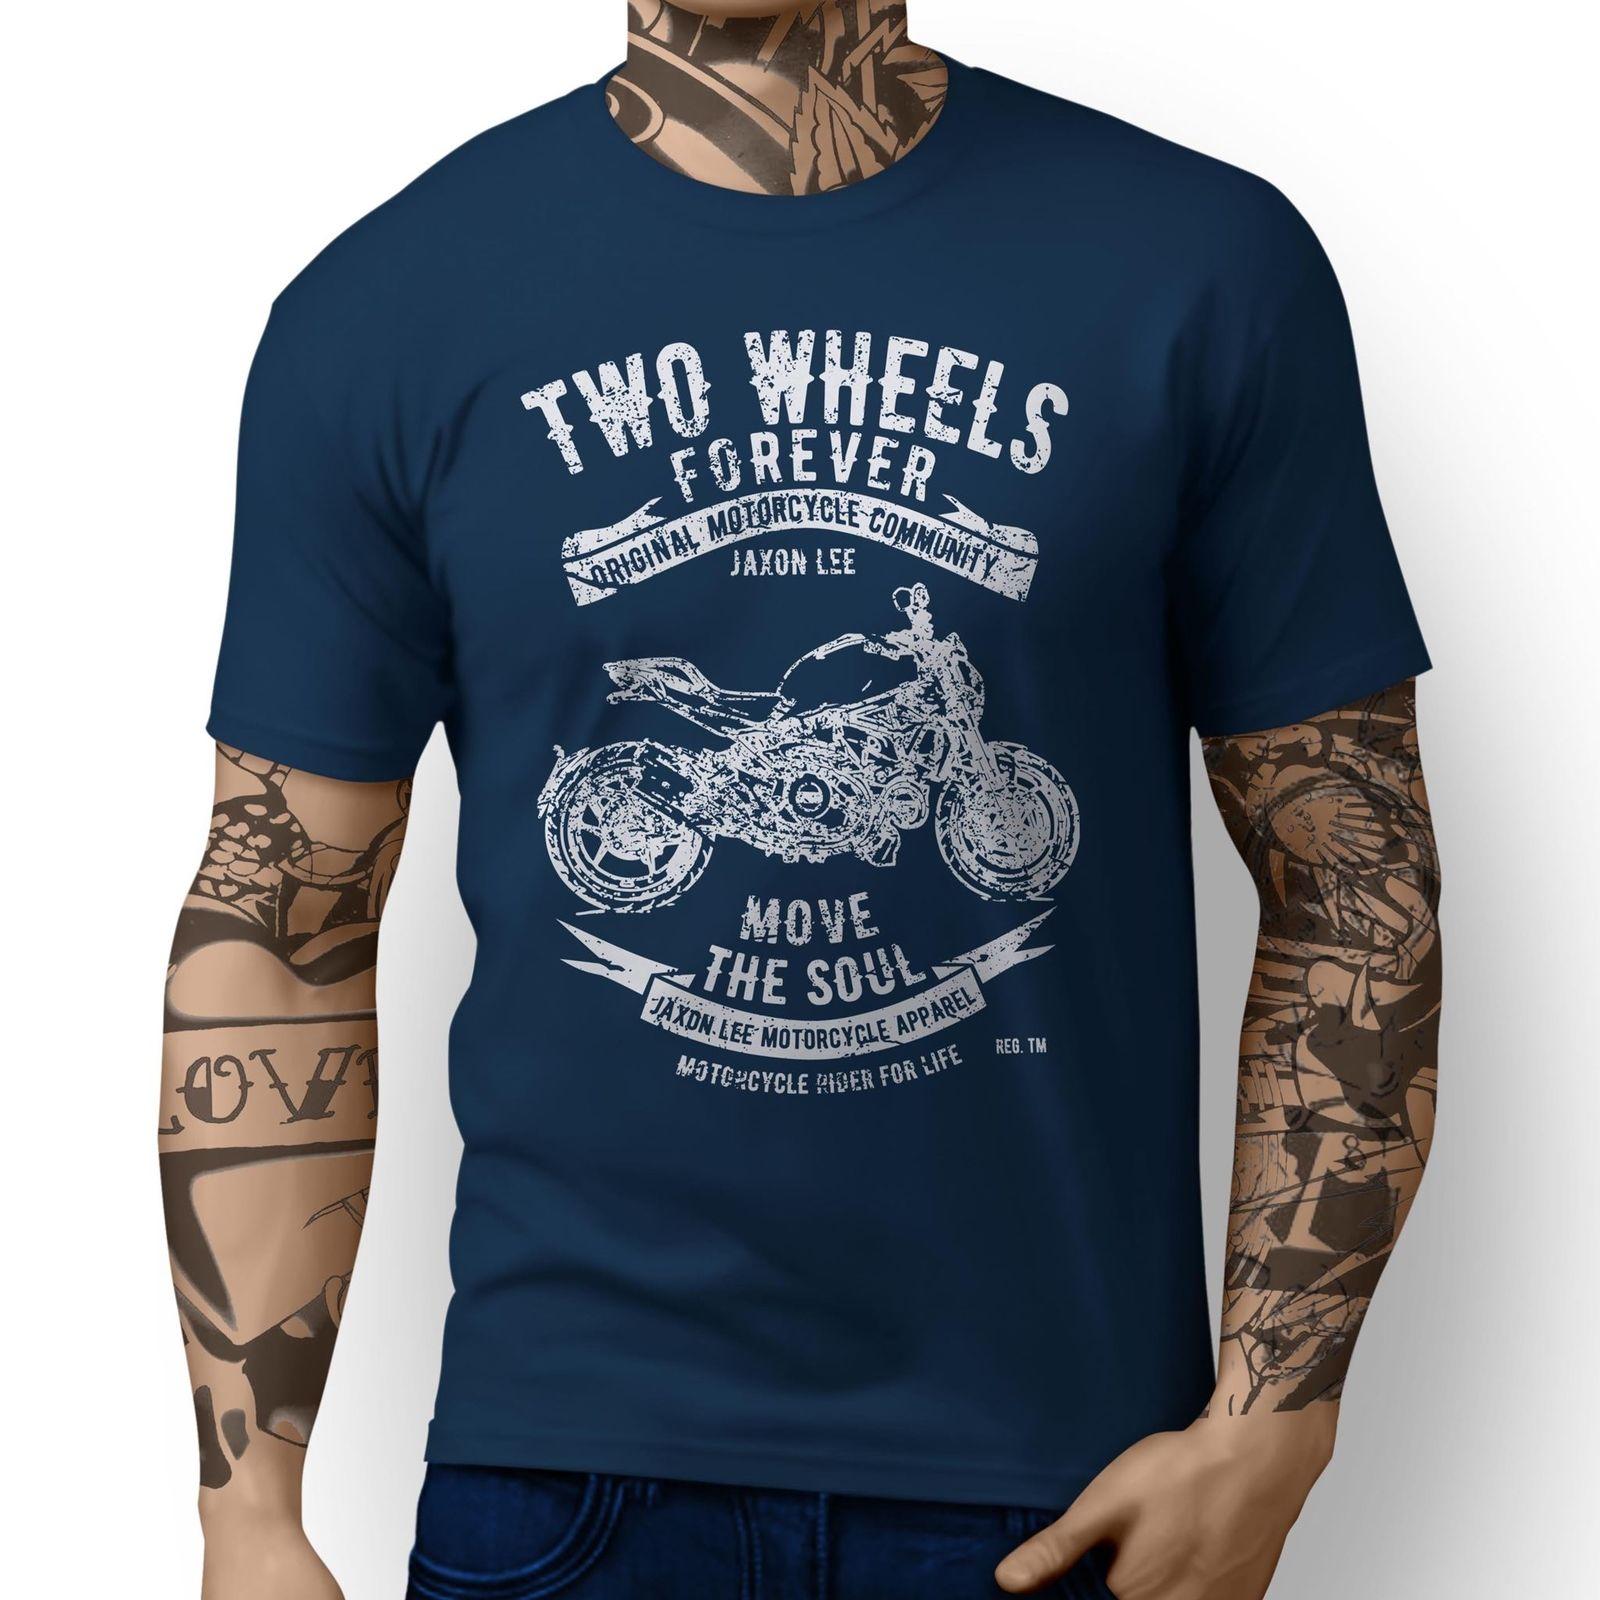 2018 Short Sleeve Cotton Man Clothing Tops Tshirt Homme Monster 1200S Inspired Motorcycle Fan Artt Shirt Sale T-shirt